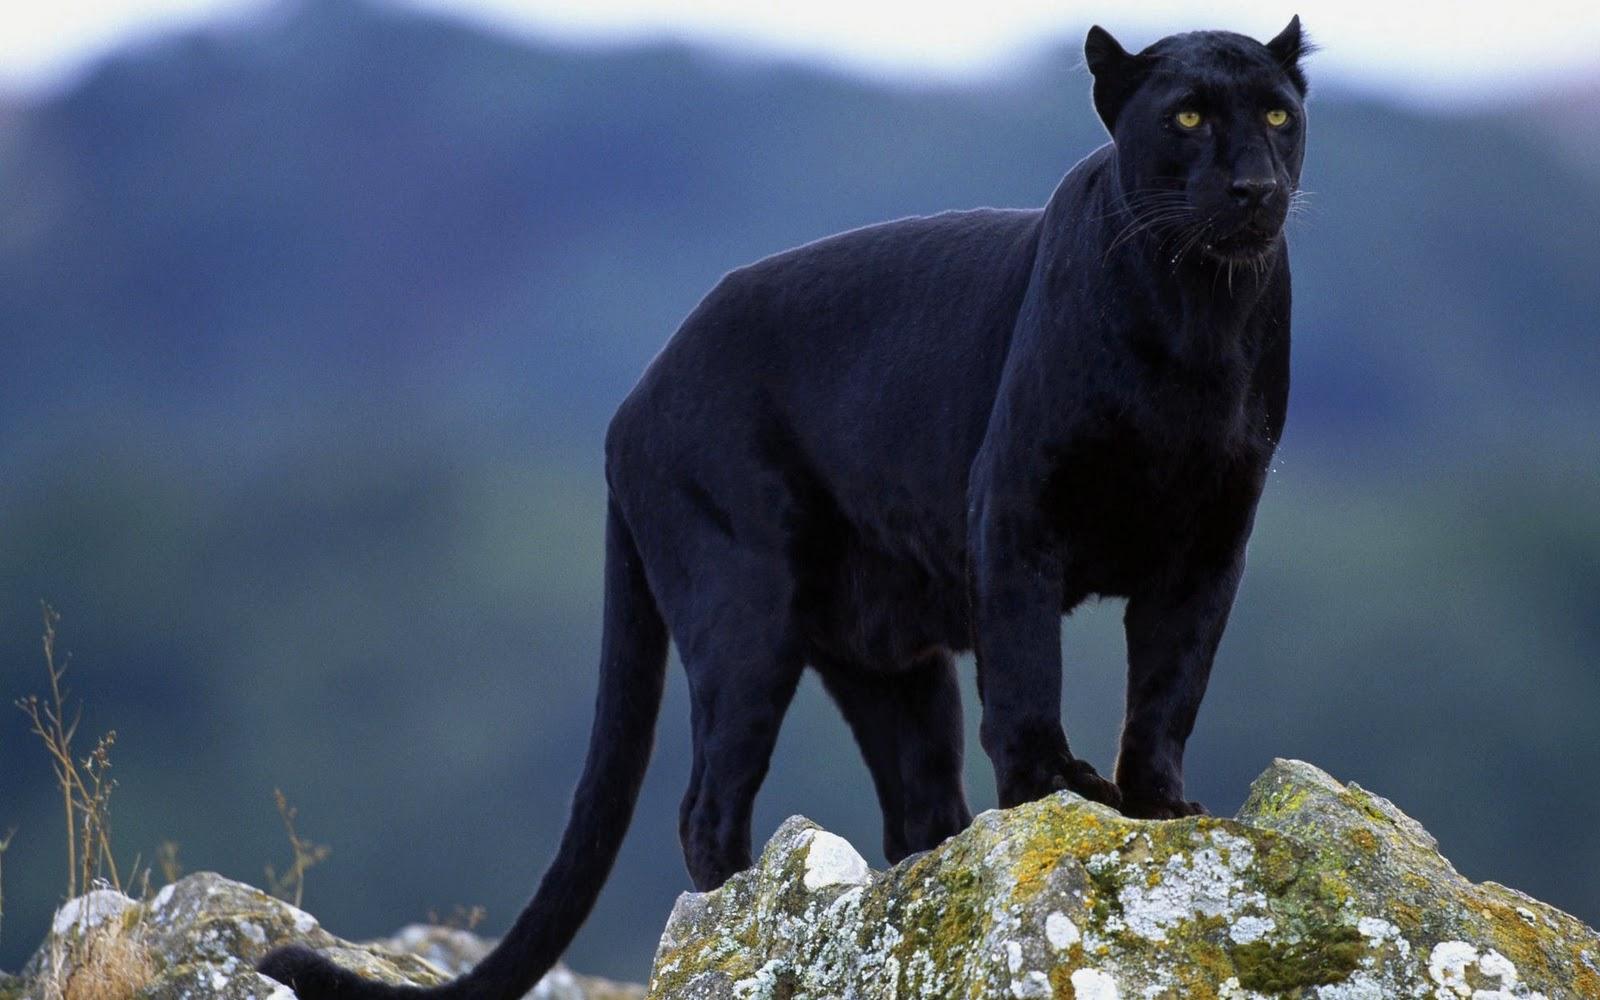 gambar macan - gambar macan